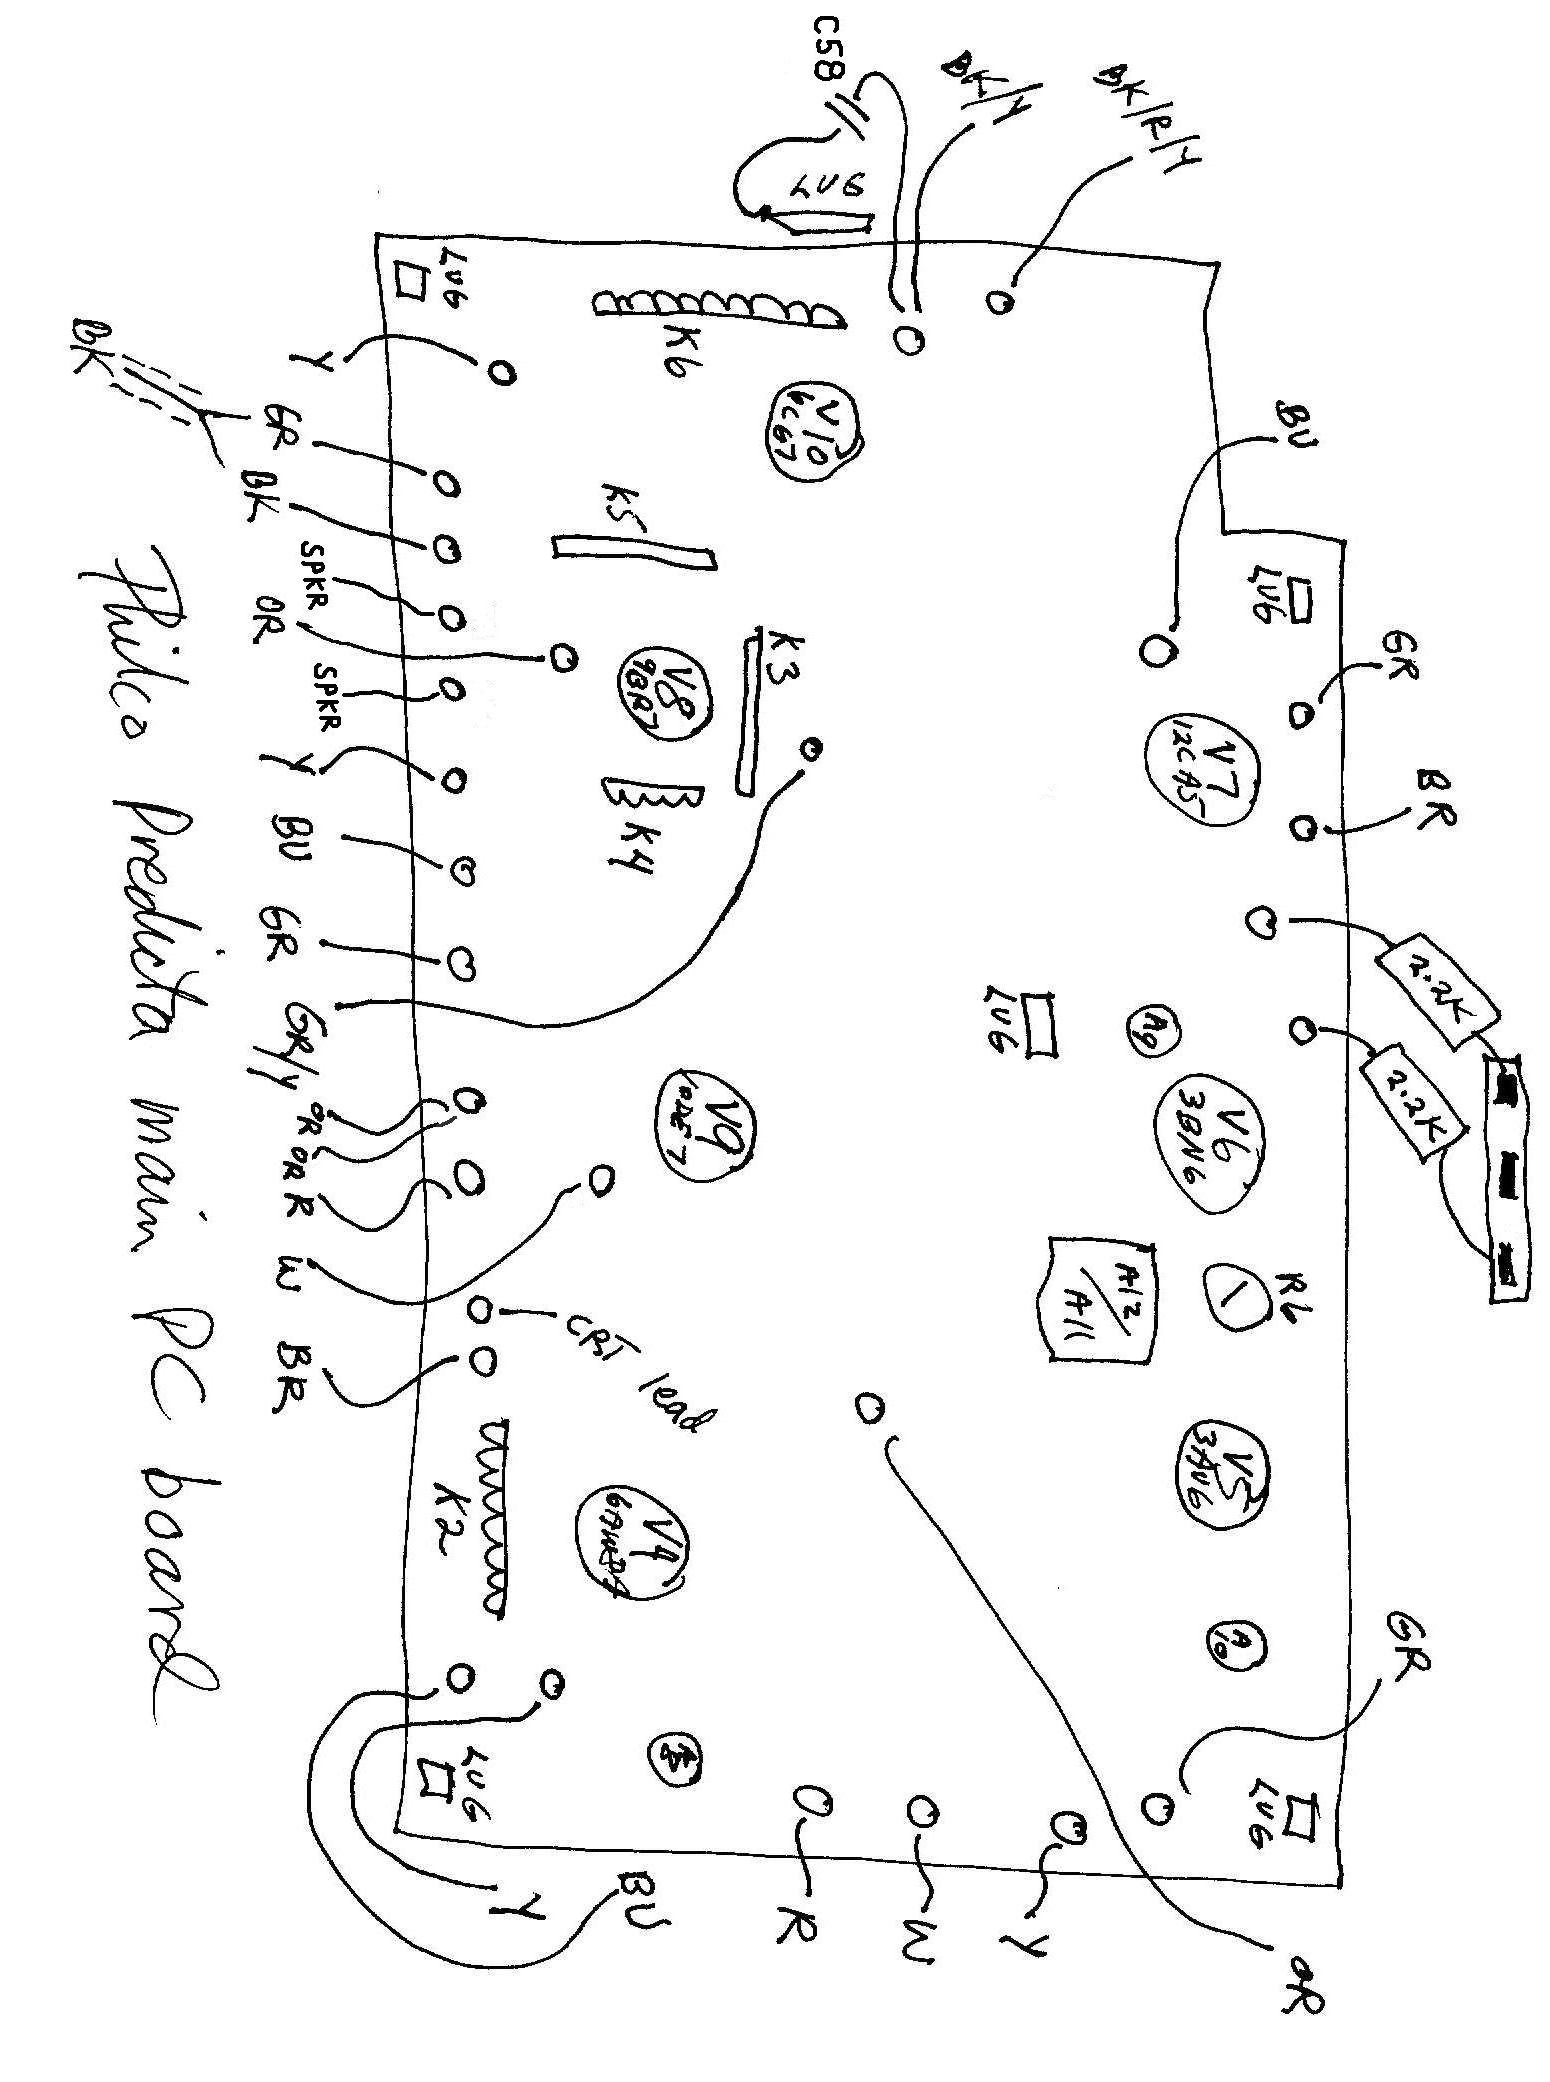 Ventilated motorcycle jacket diagram schematic ventilated motorcycle jacket diagram schematic